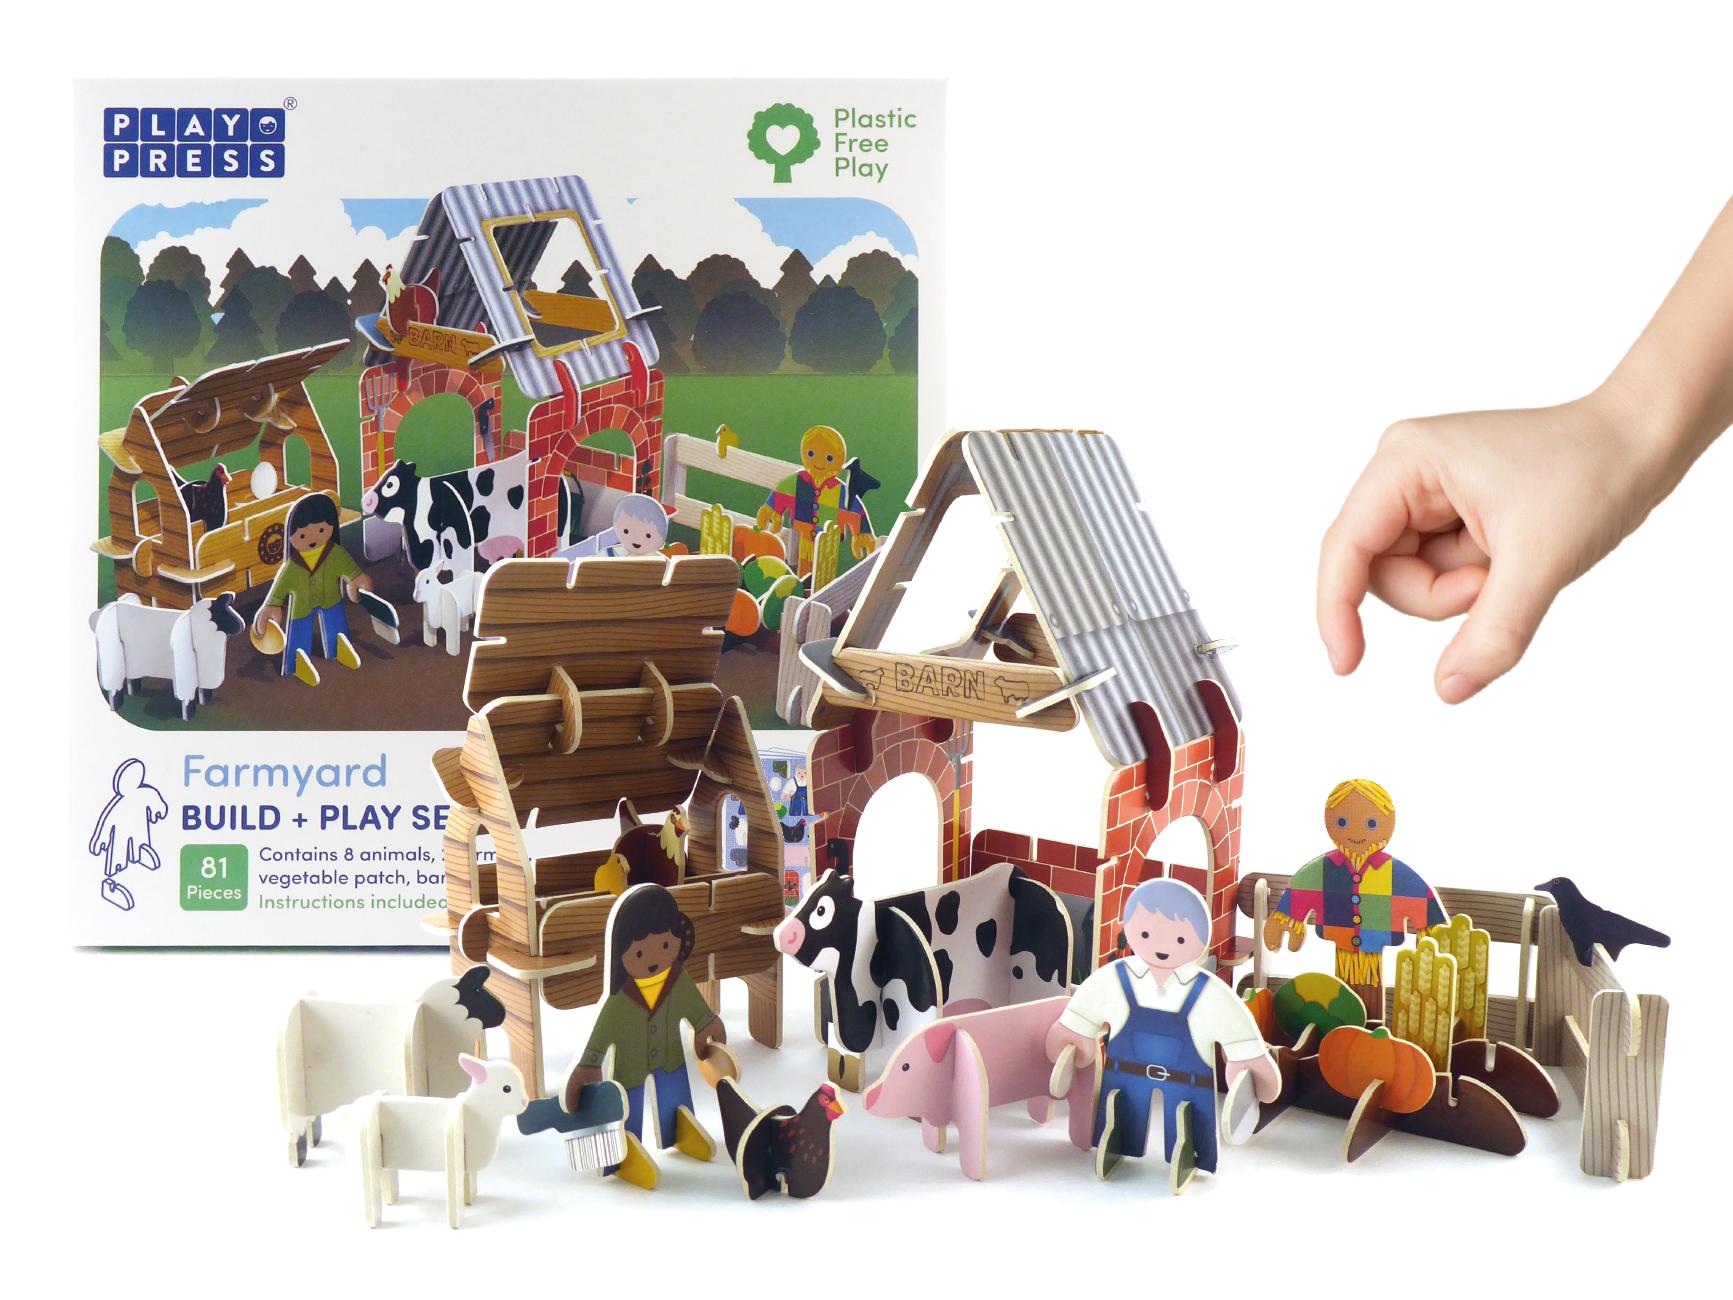 Play Press - Farmyard Playset